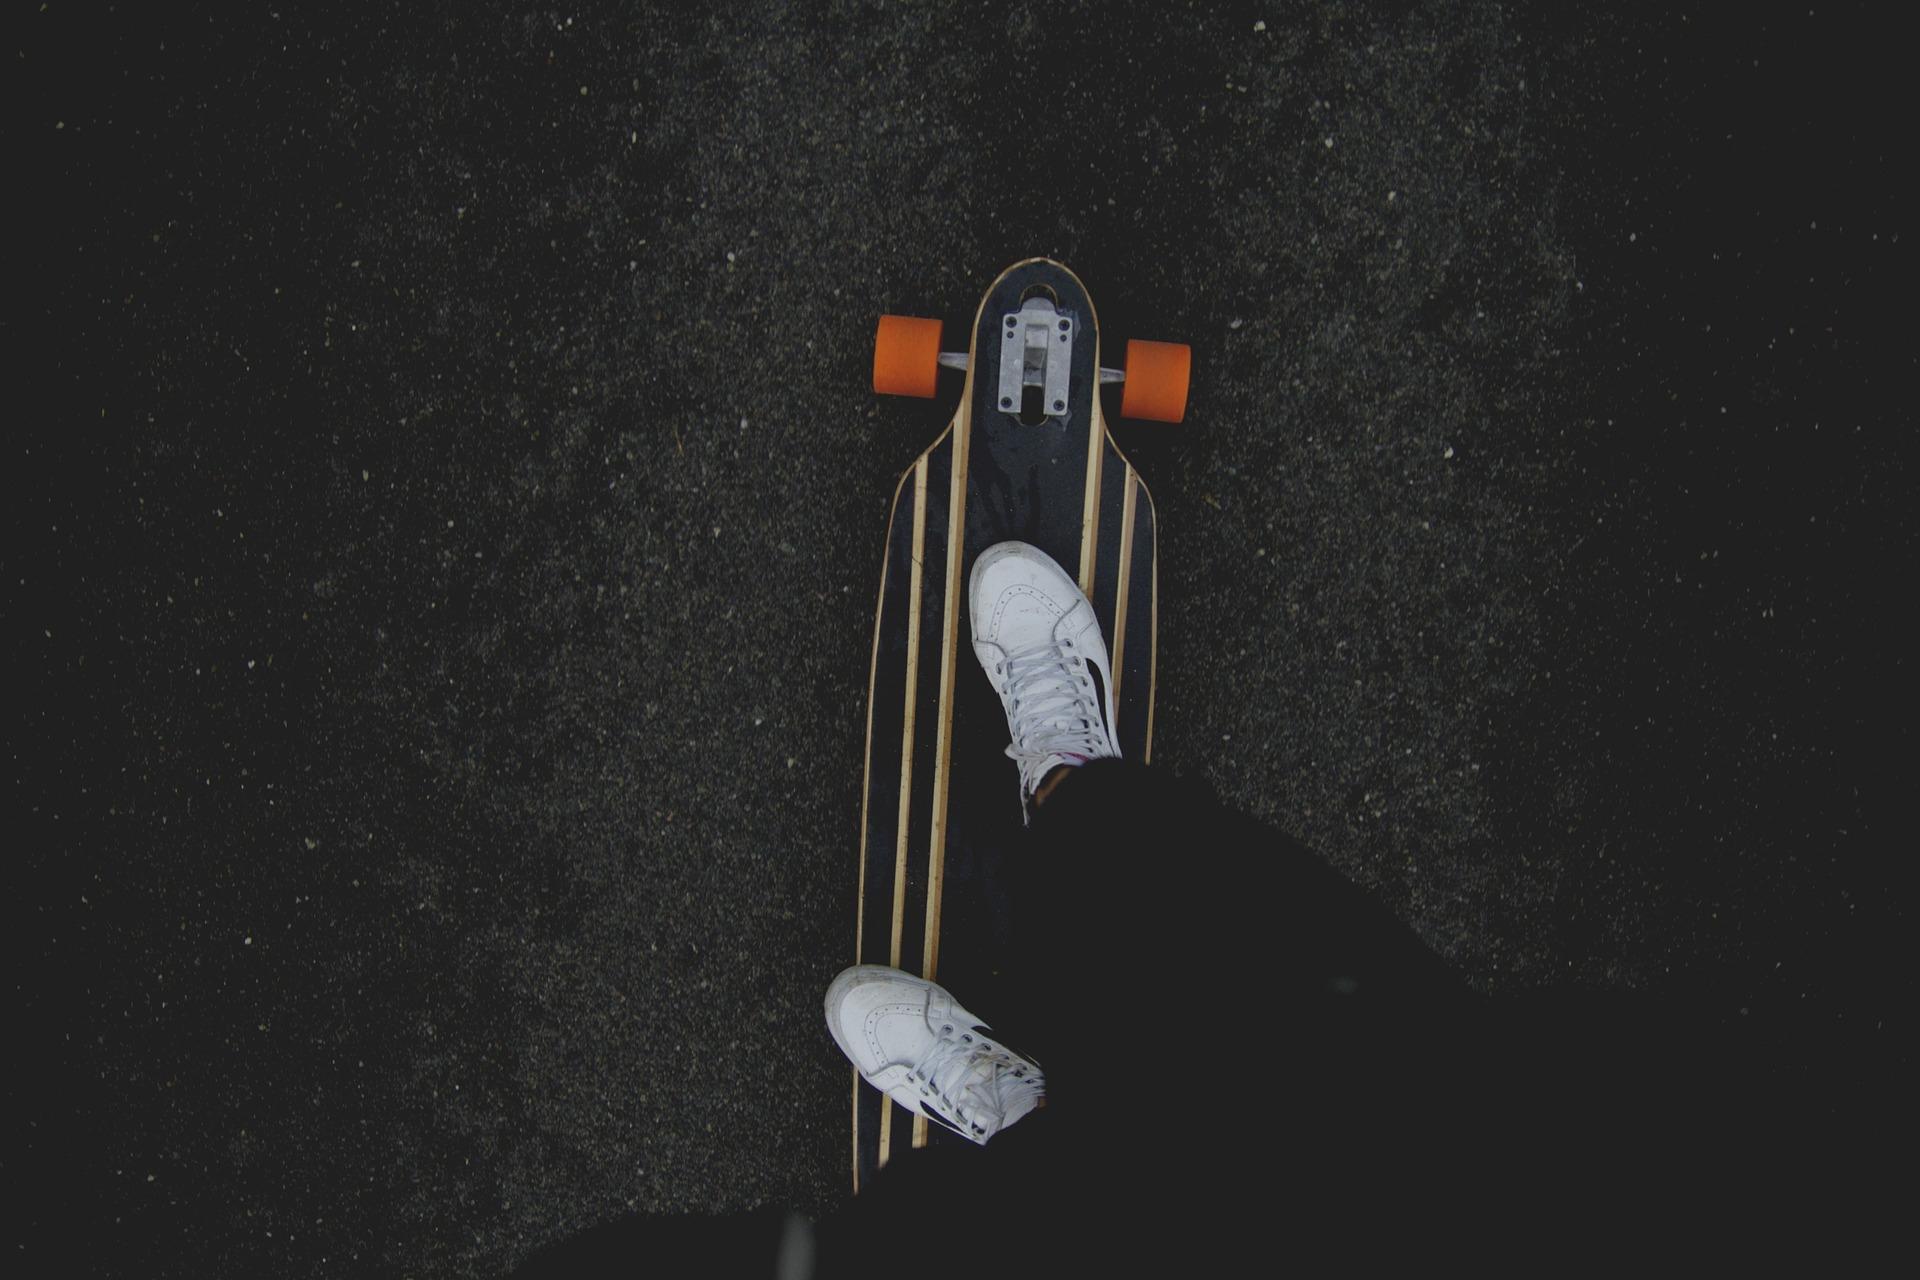 skateboard-1149863_1920